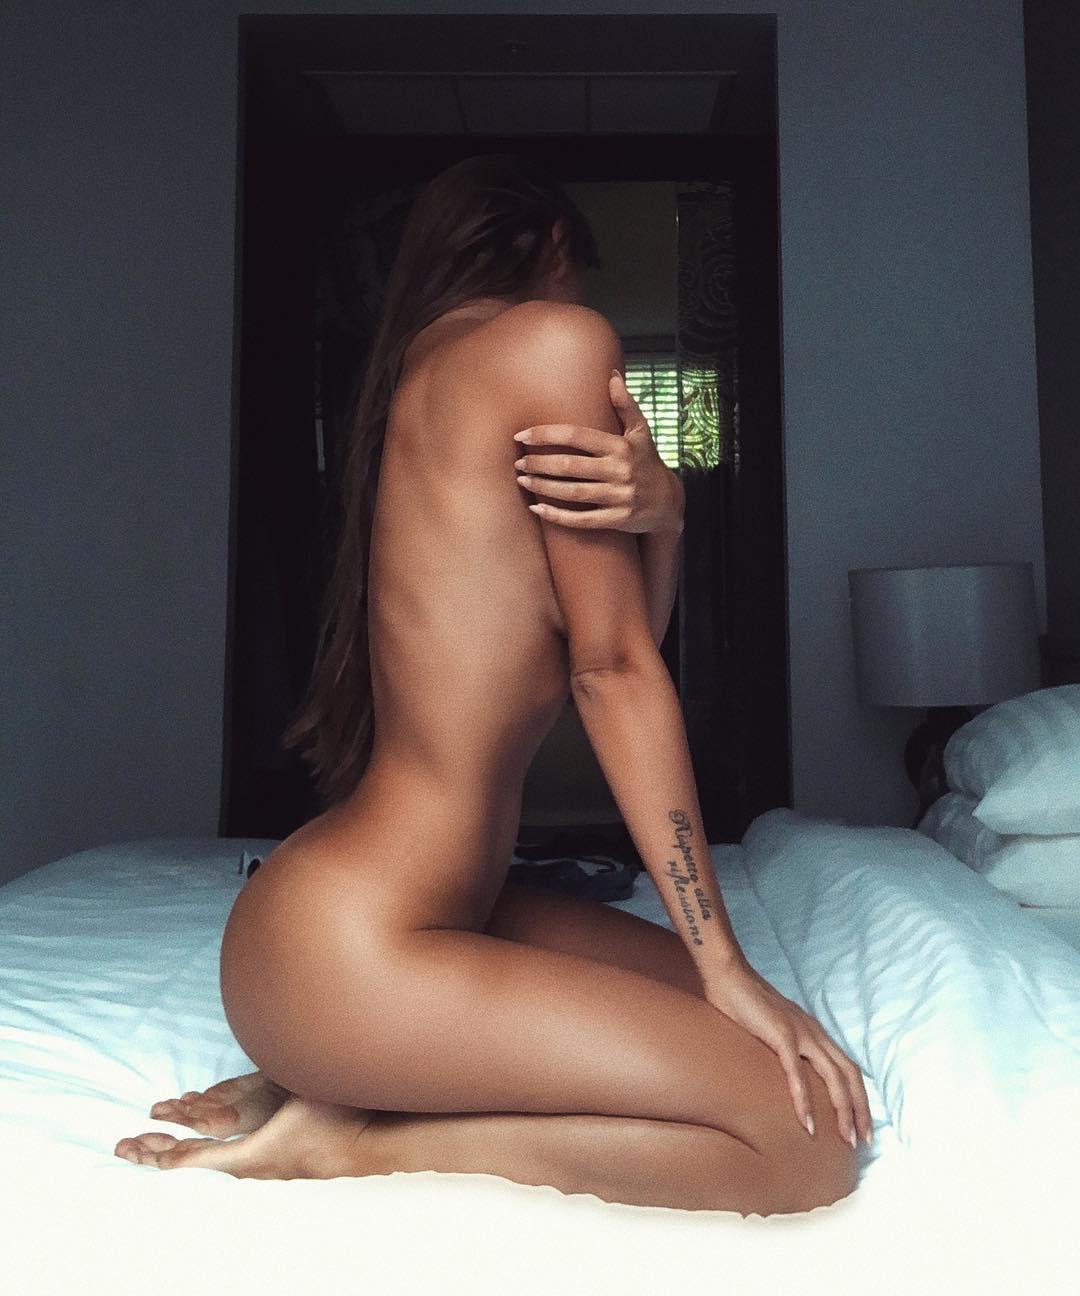 viki odintcova nude sport string thong bikini porn ass sexy naked